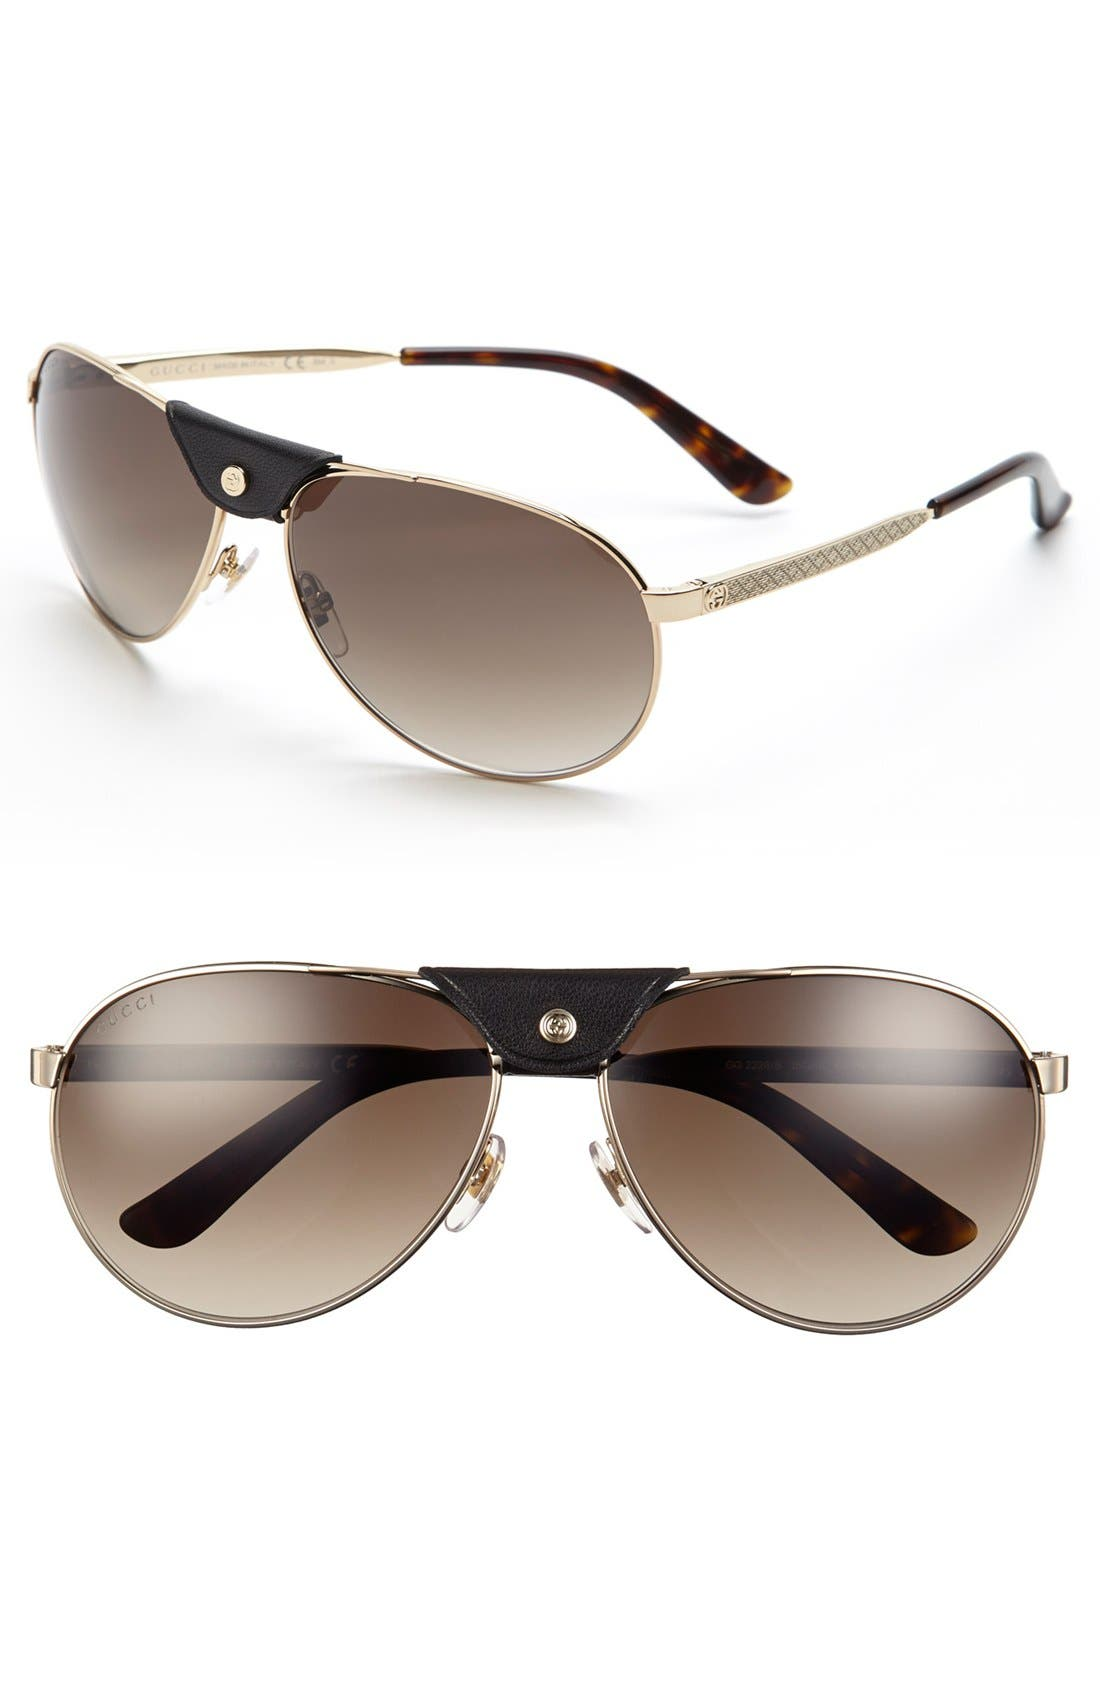 Main Image - Gucci 63mm Aviator Sunglasses